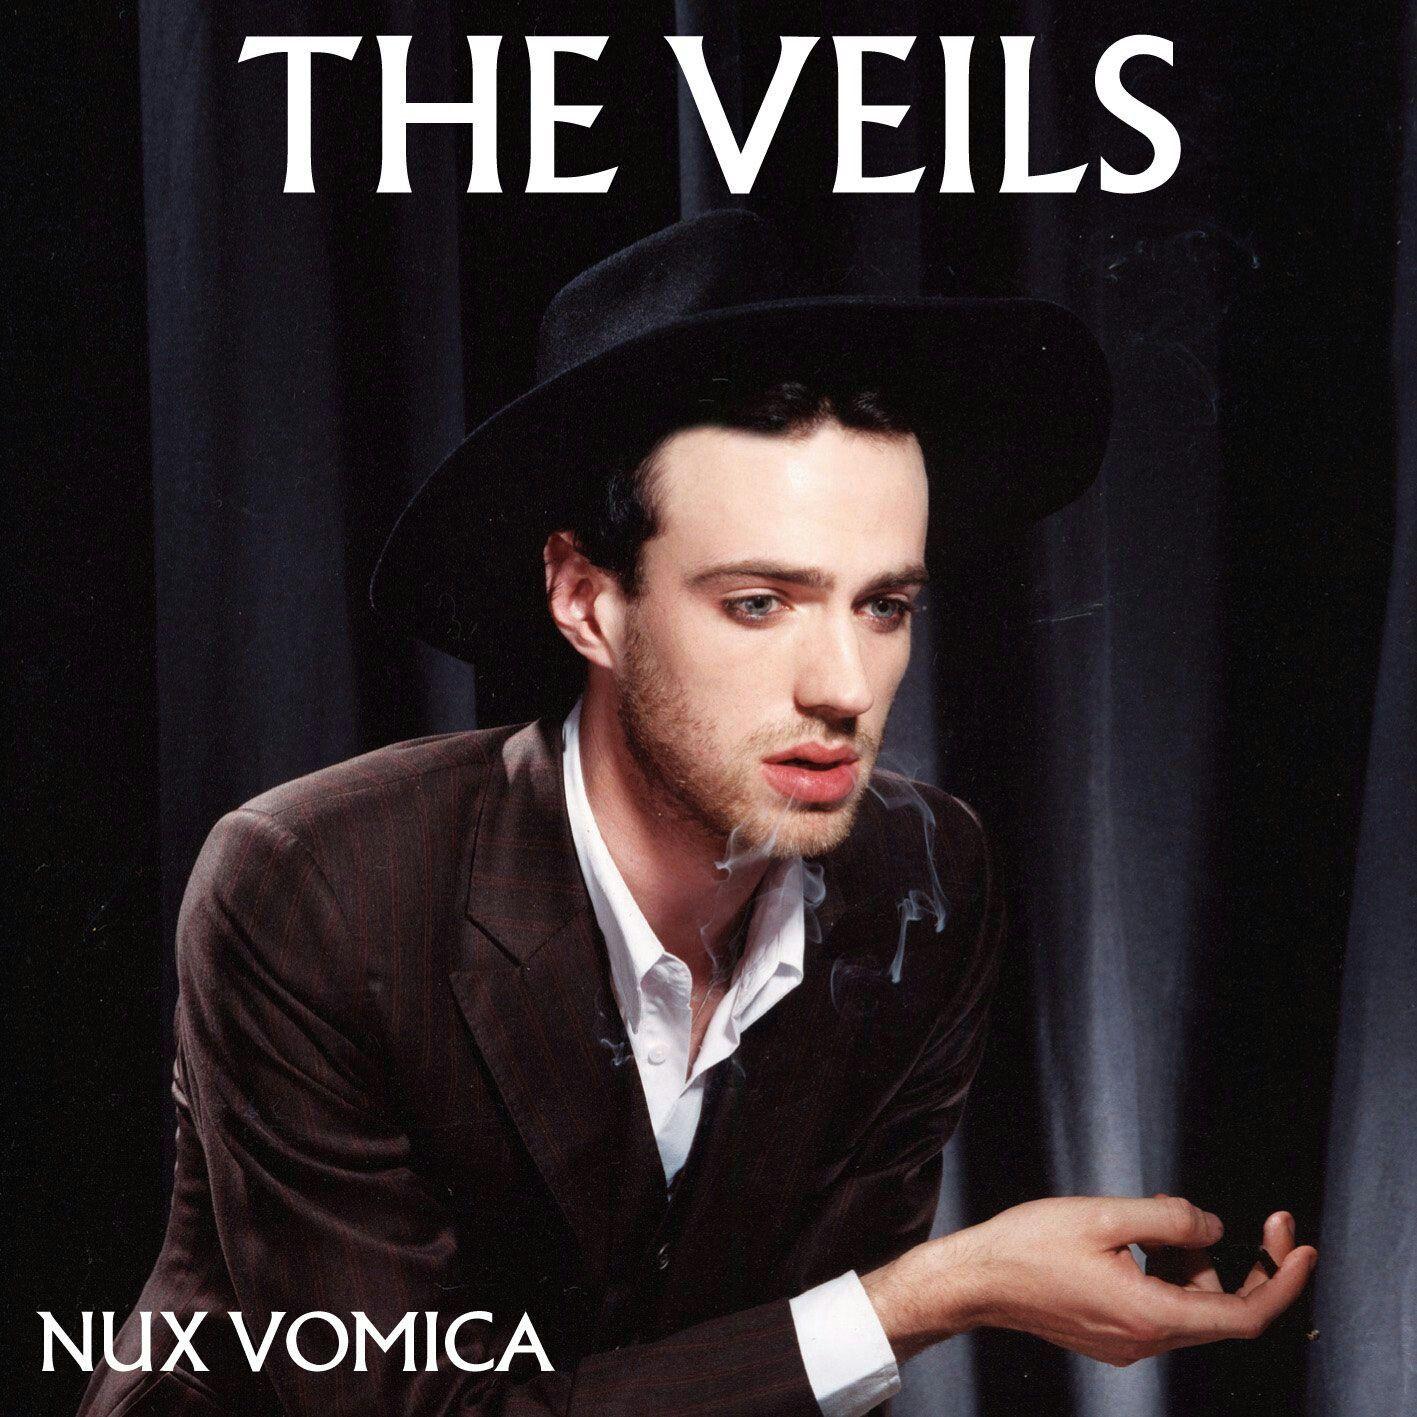 Nux vomica Vinyl, Veil